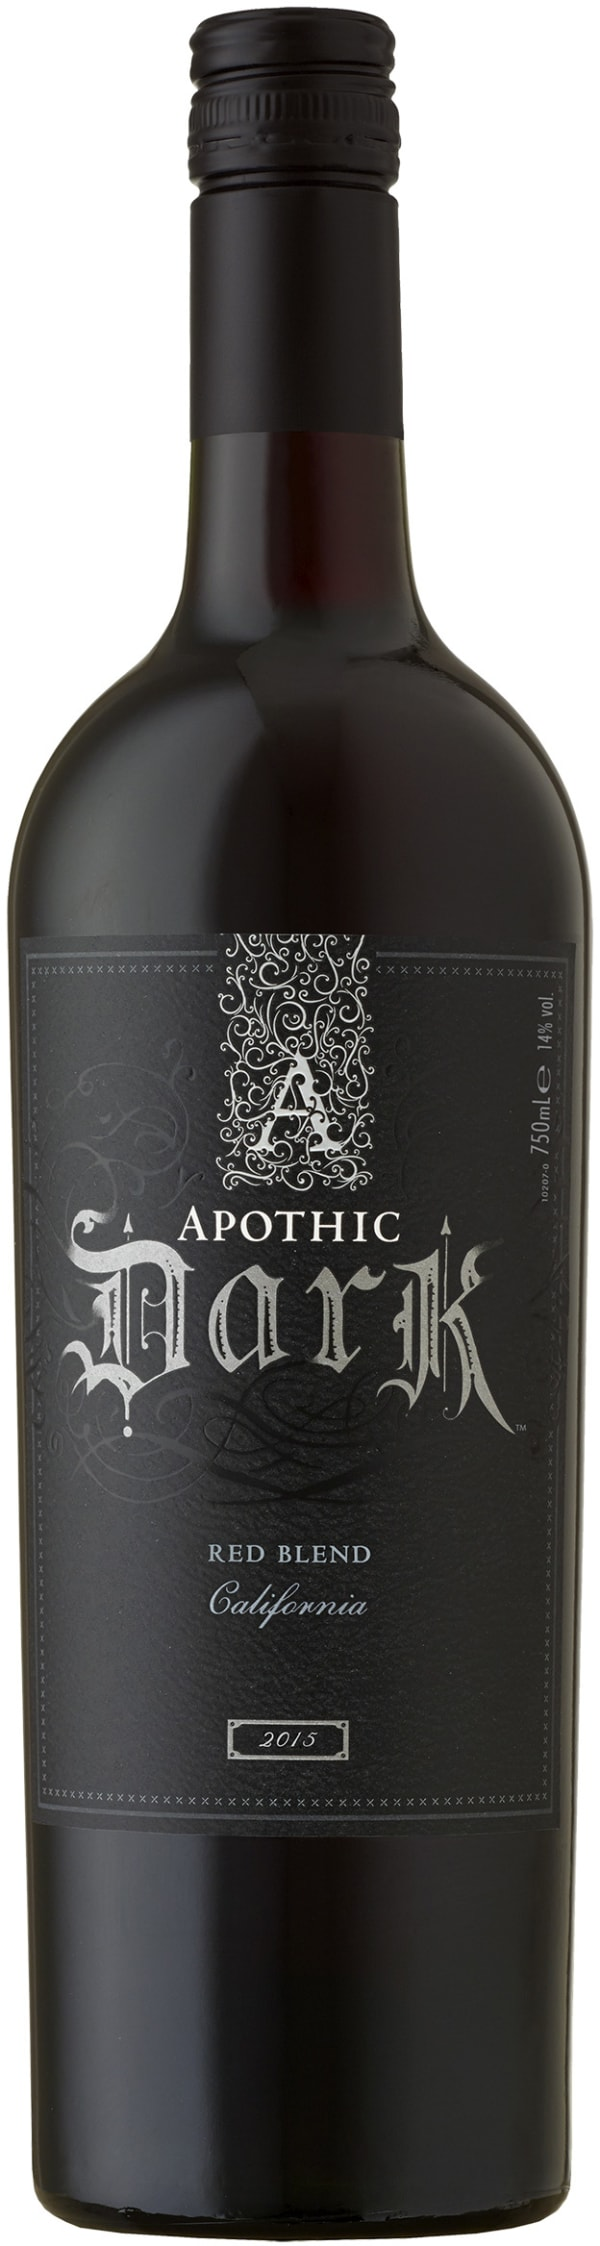 Apothic Dark 2015